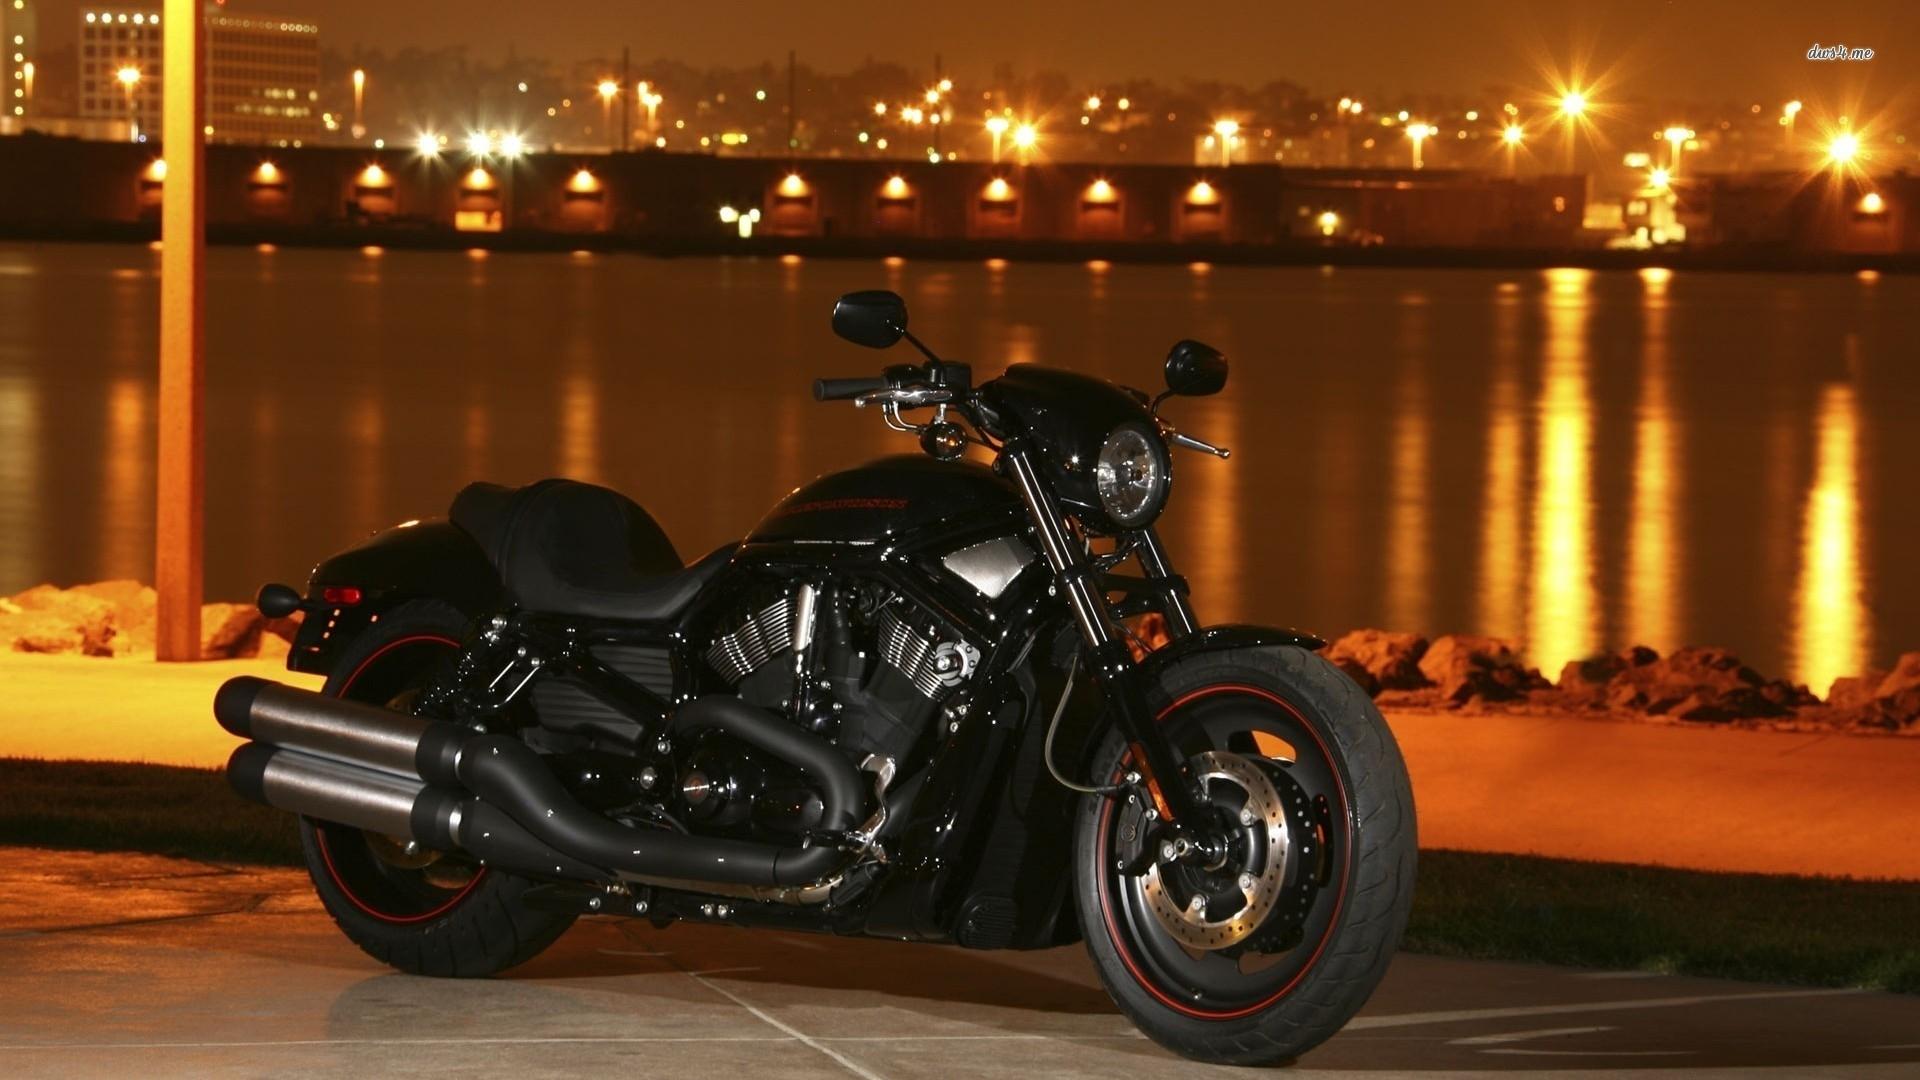 amazing black motorcycle harley davidson wallp #10703 wallpaper